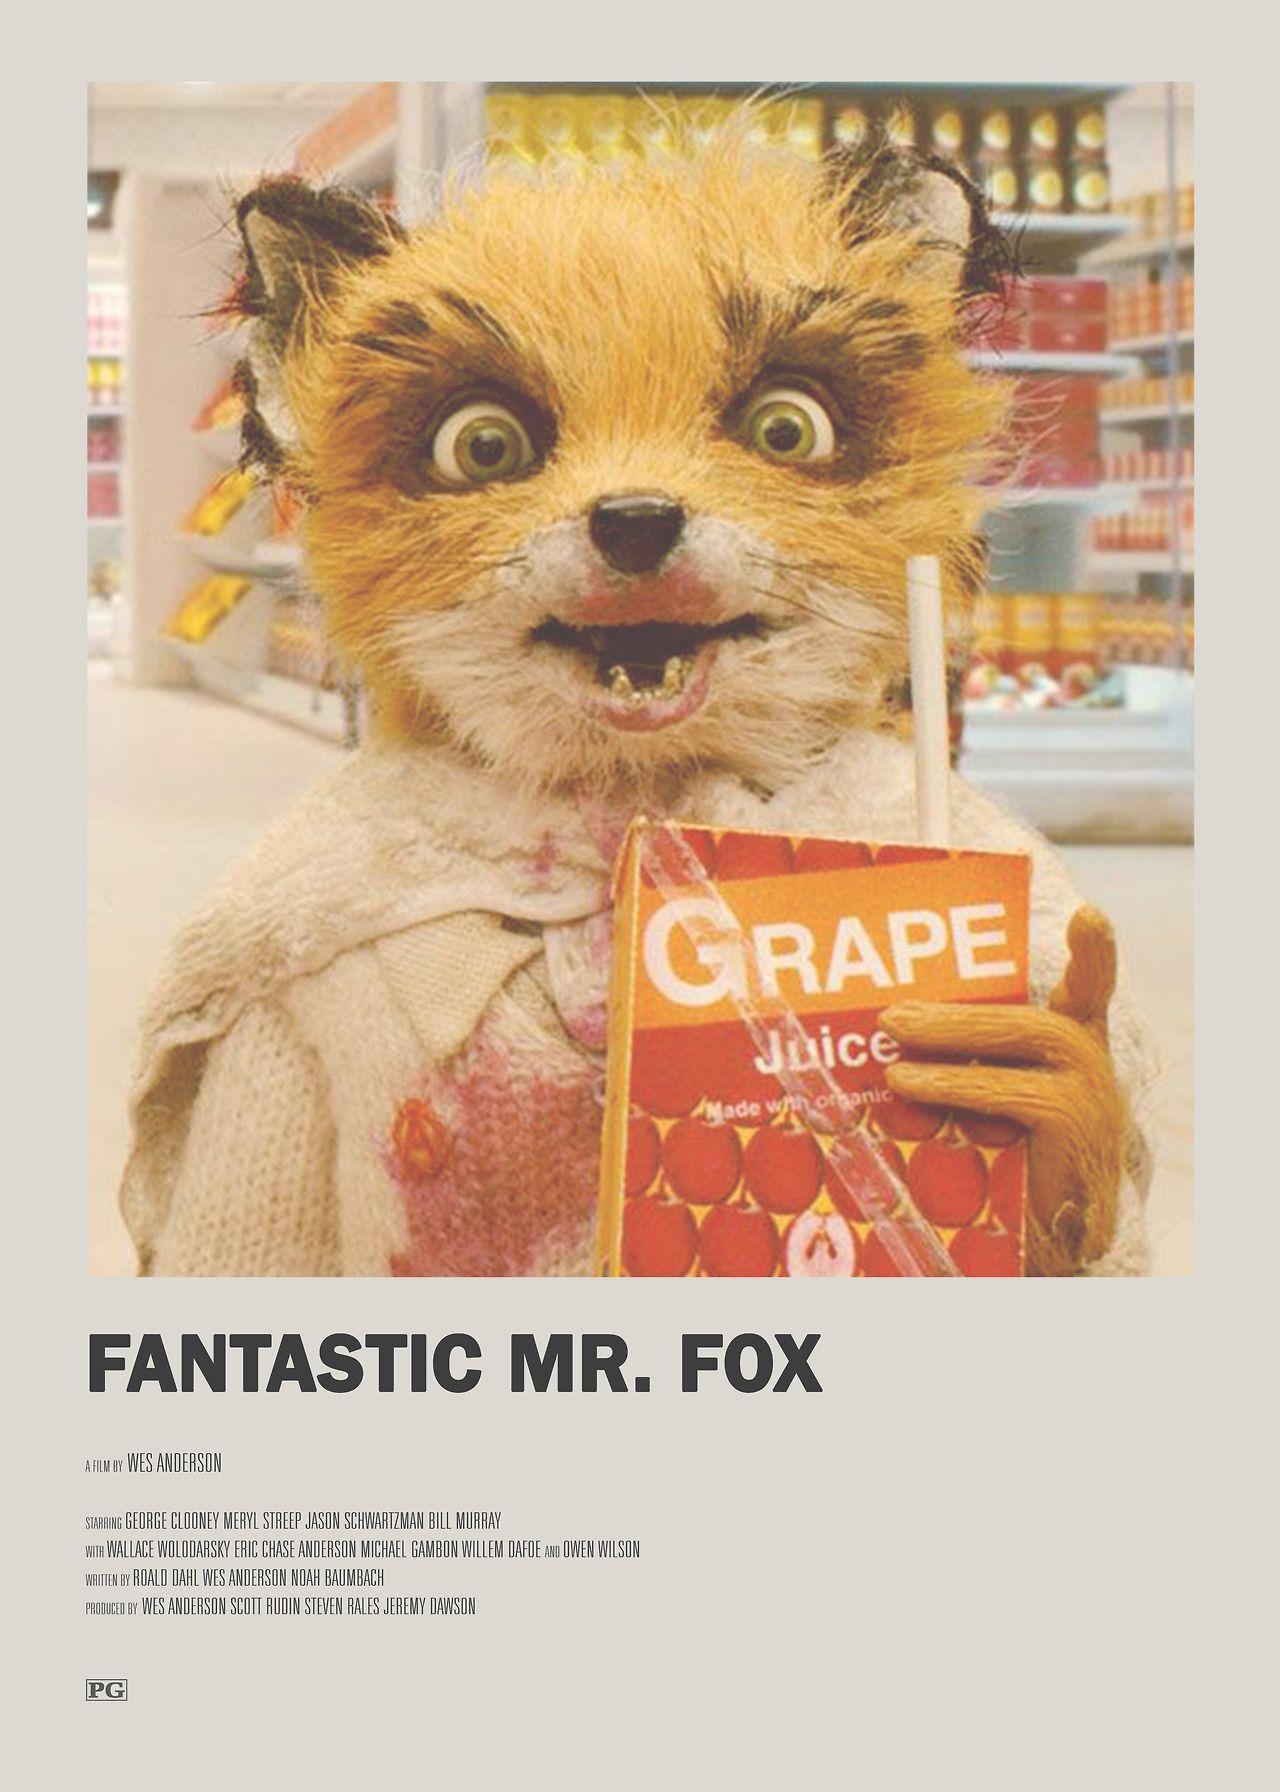 Fantastic Mr Fox Minimal Movie Poster Minimal Movie Posters Film Poster Design Movie Poster Wall